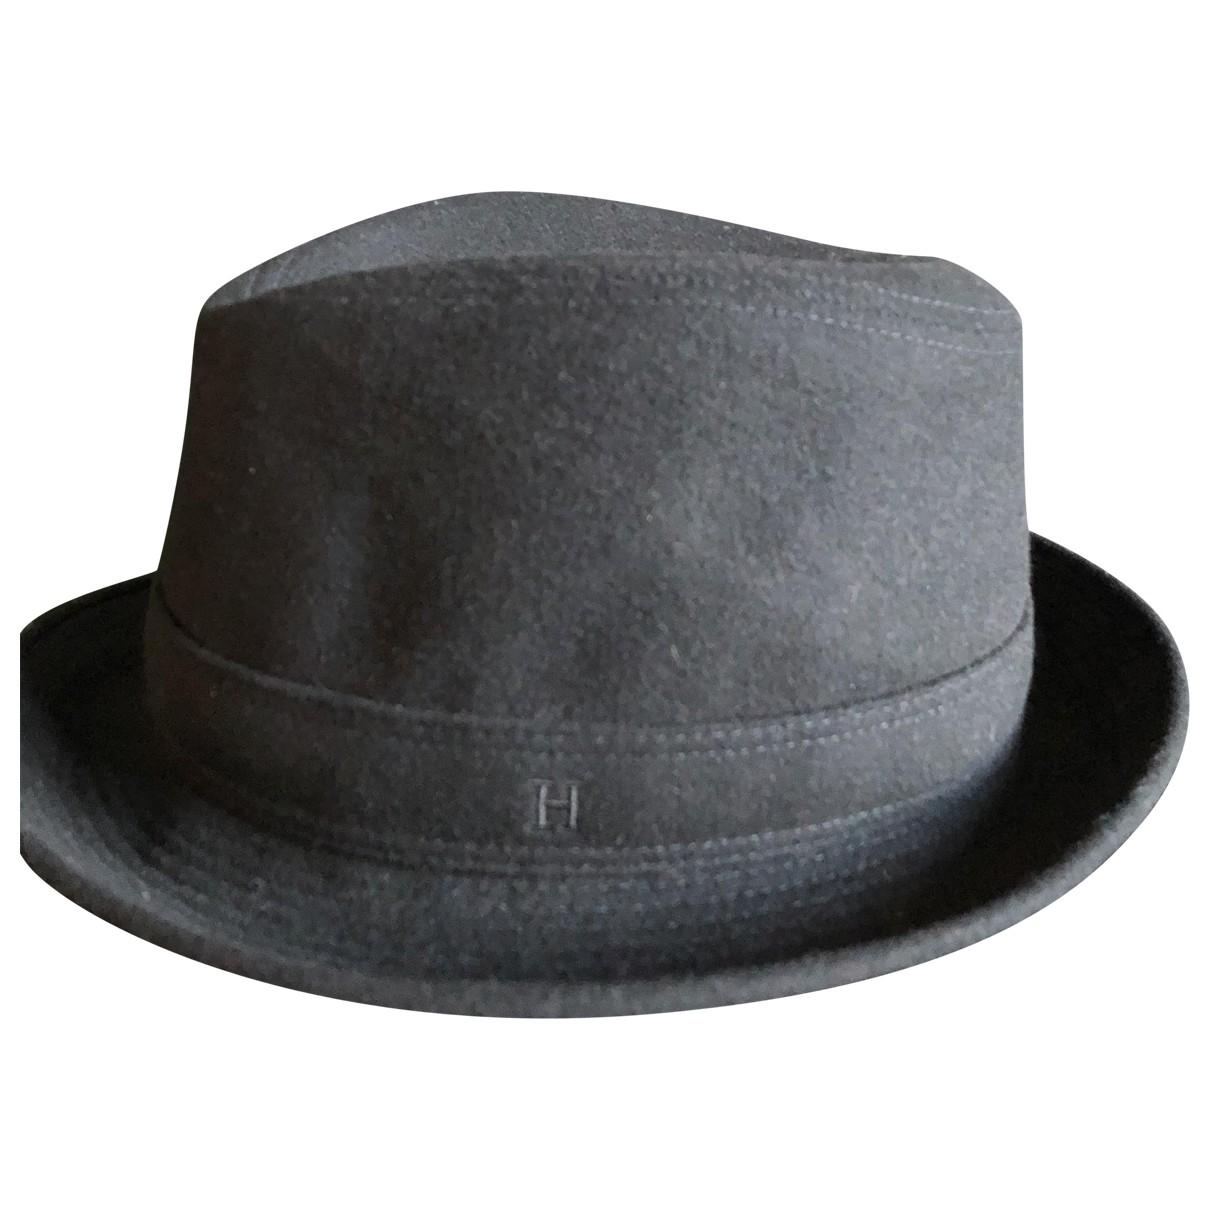 Sombrero / gorro de Cachemira Hermes